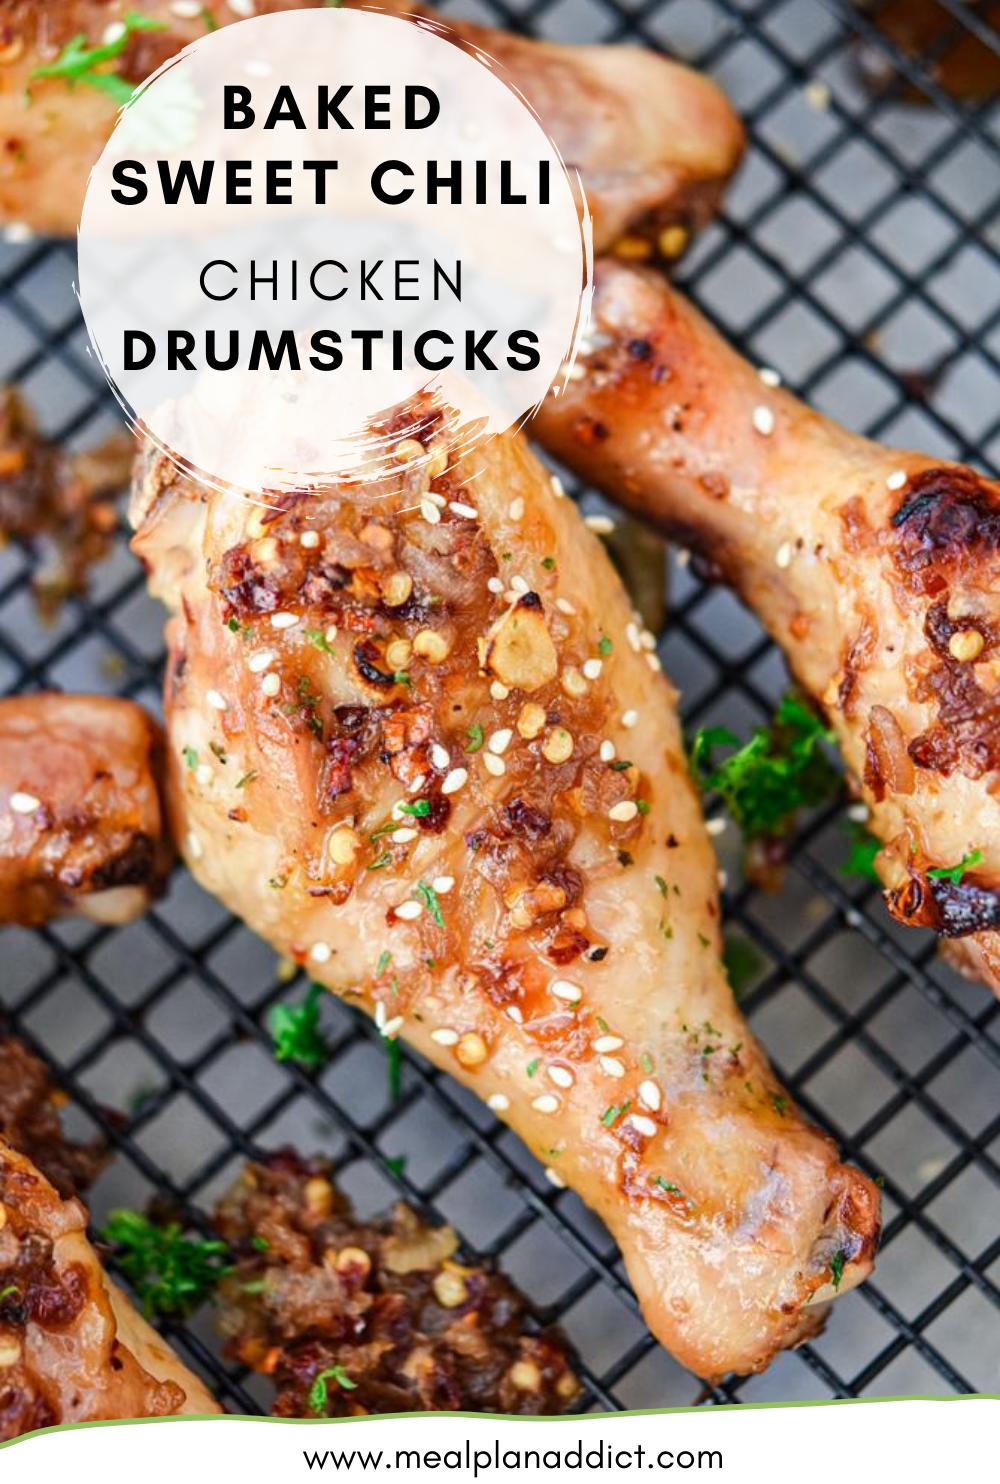 Baked Sweet Chili Chicken Drumsticks